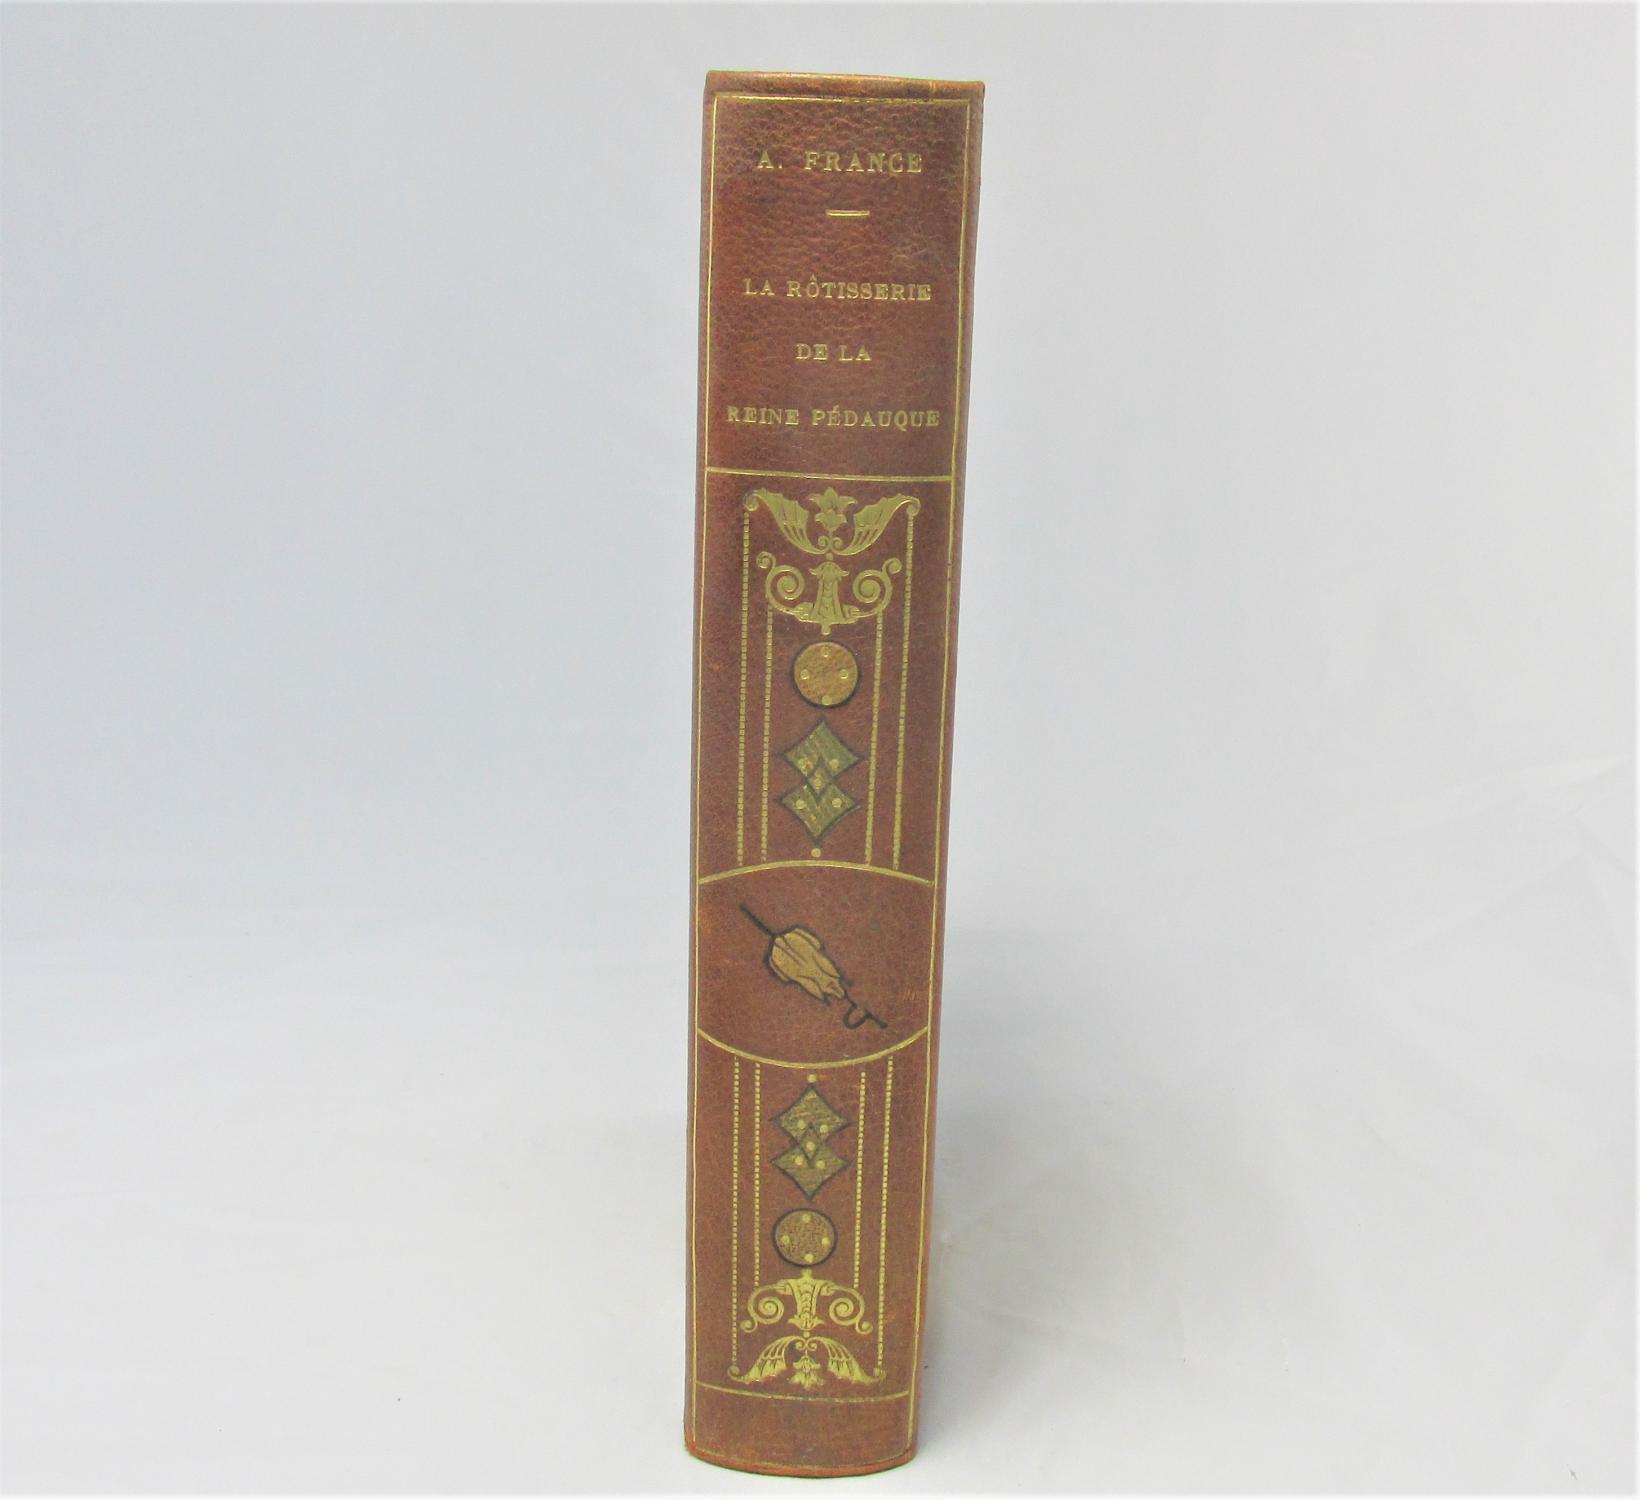 La Rotisserie de La Reine Pedauque [At the Sign of the Reine Pedauque] Anatole France Very Good Hardcover